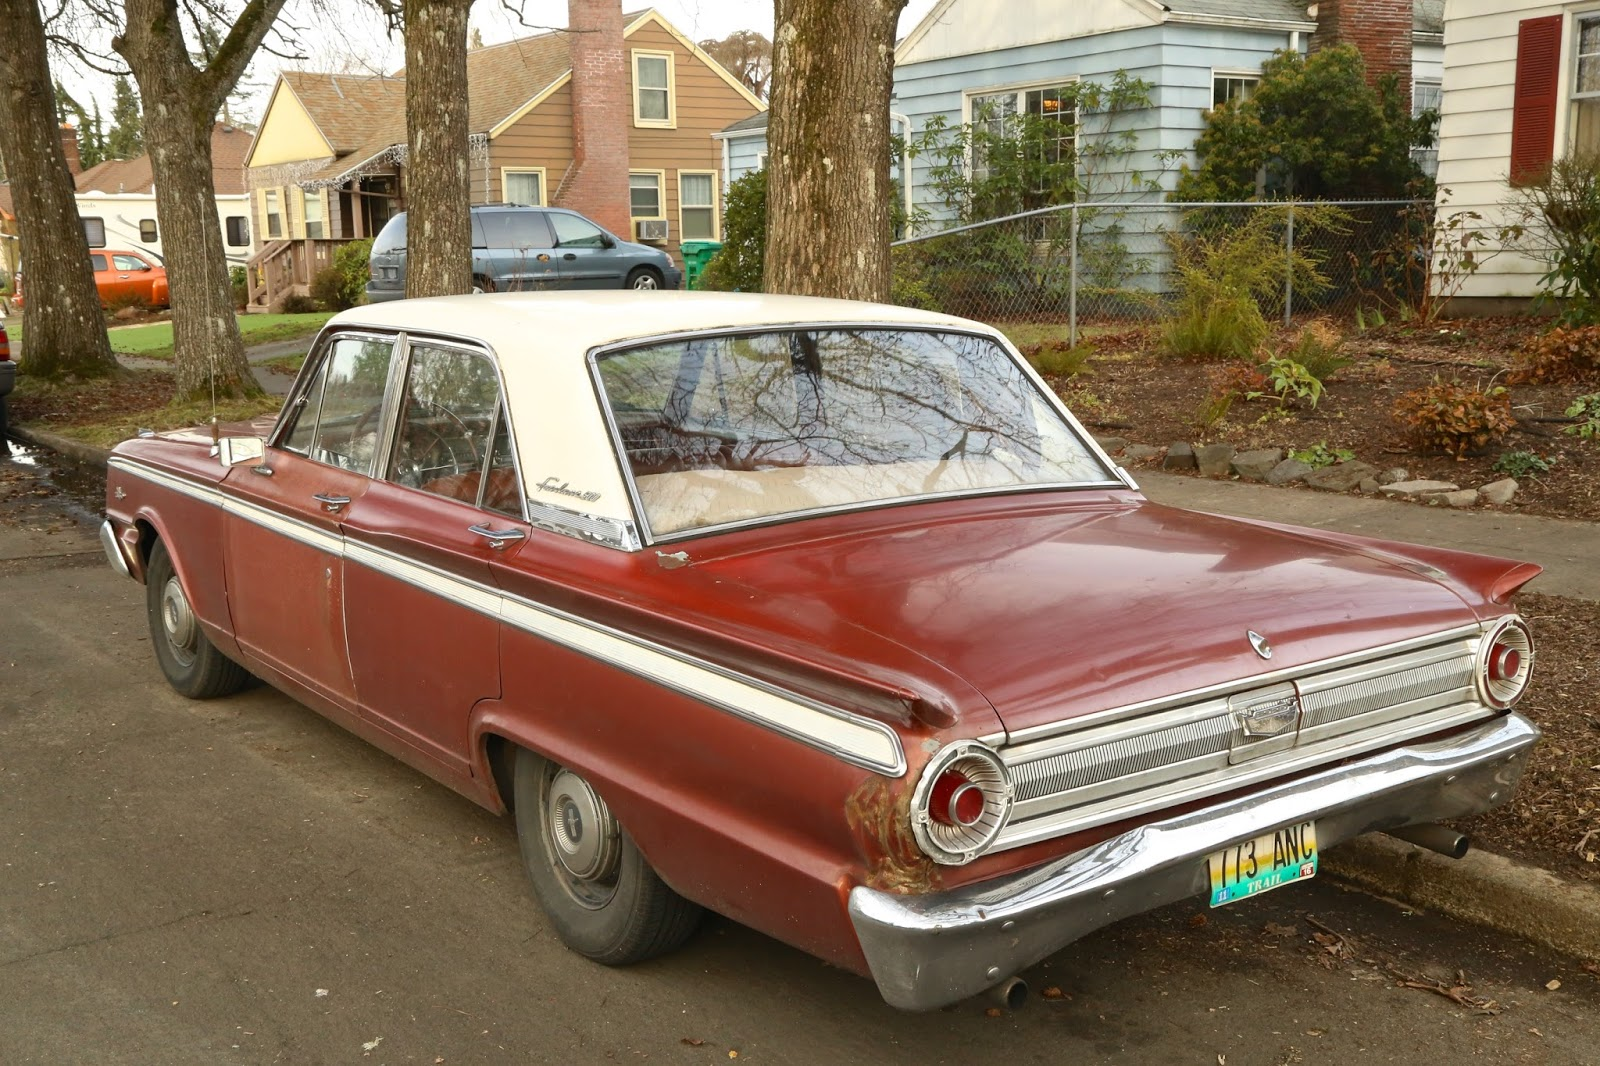 old parked cars 1963 ford fairlane 500. Black Bedroom Furniture Sets. Home Design Ideas